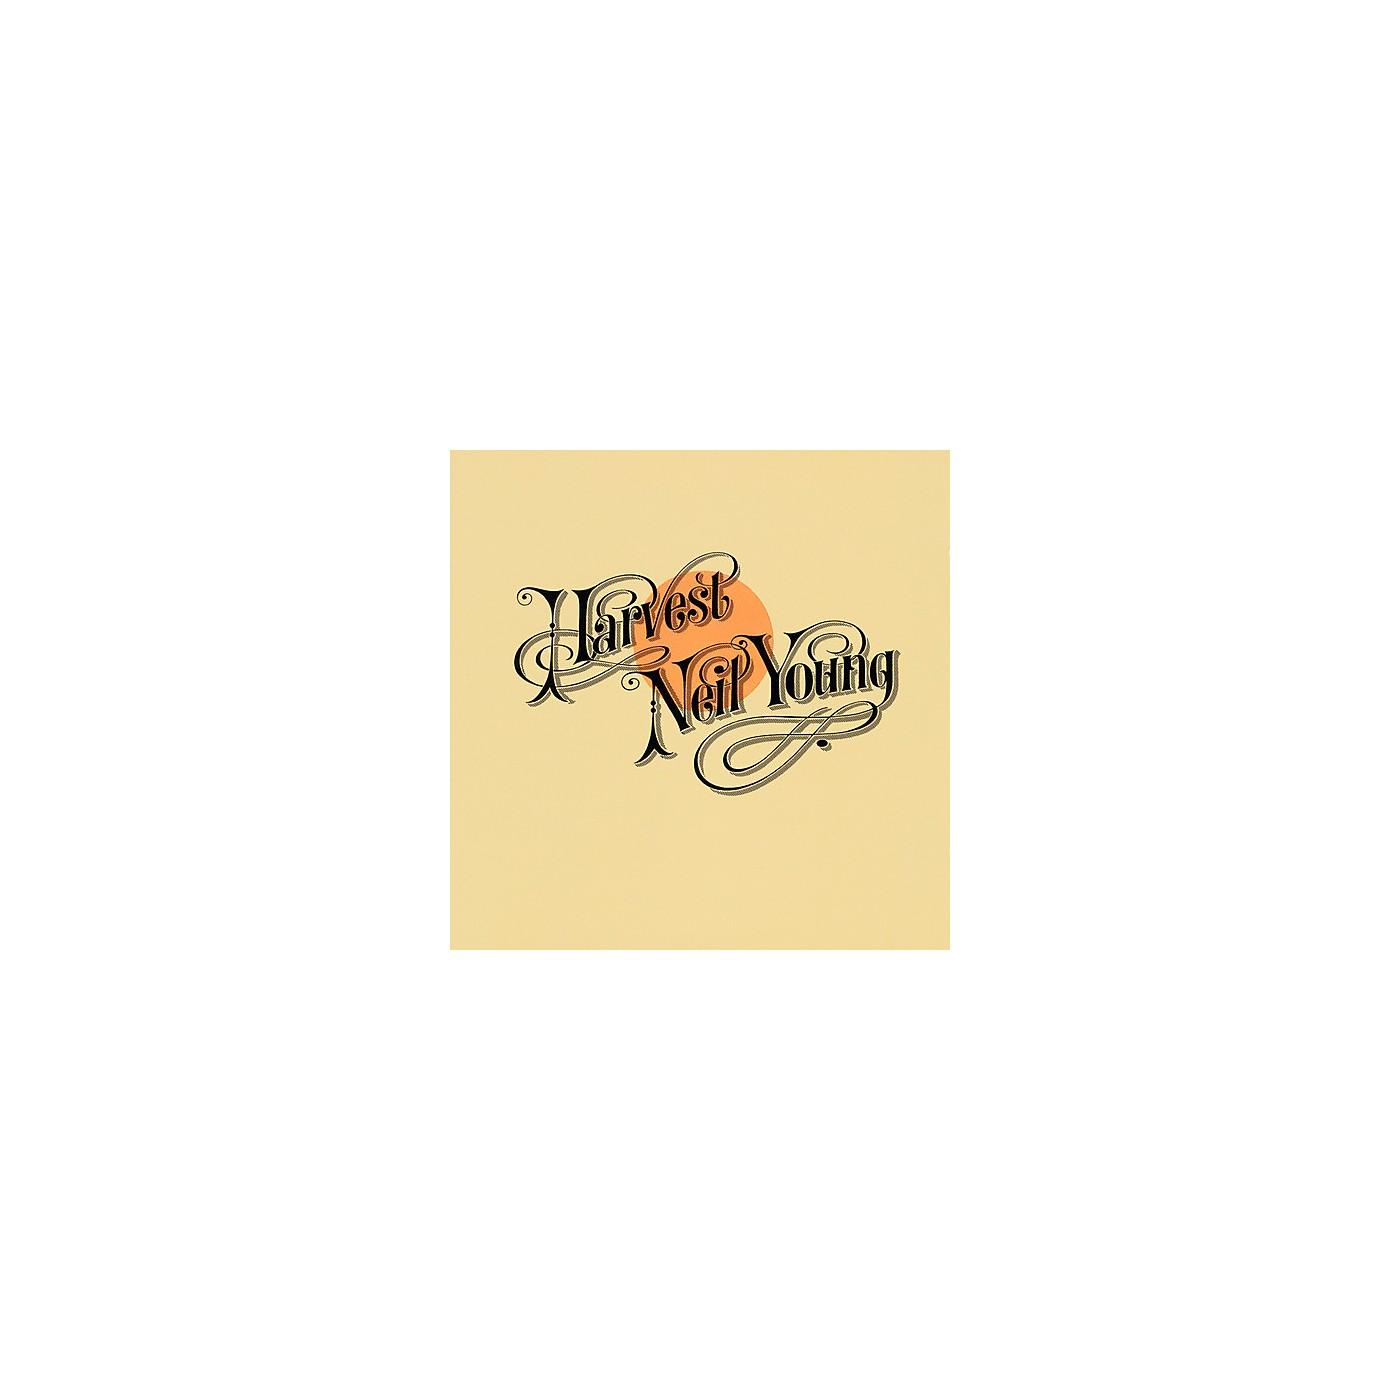 Alliance Neil Young - Harvest thumbnail